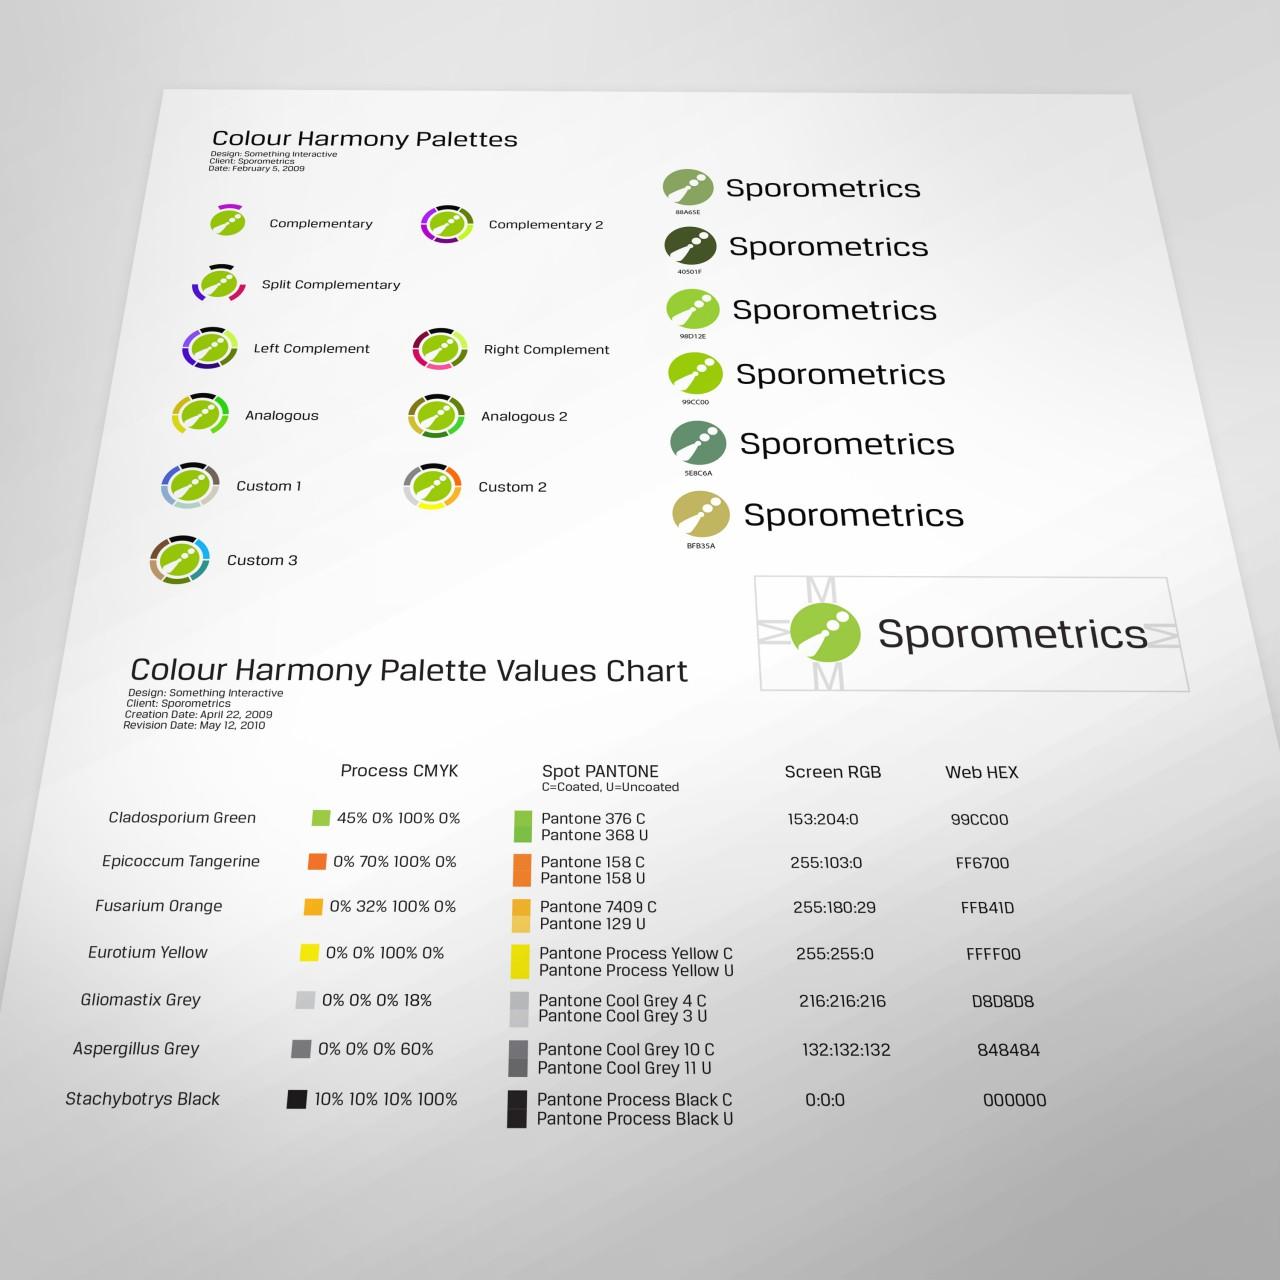 Image of Sporometrics logo color process chart